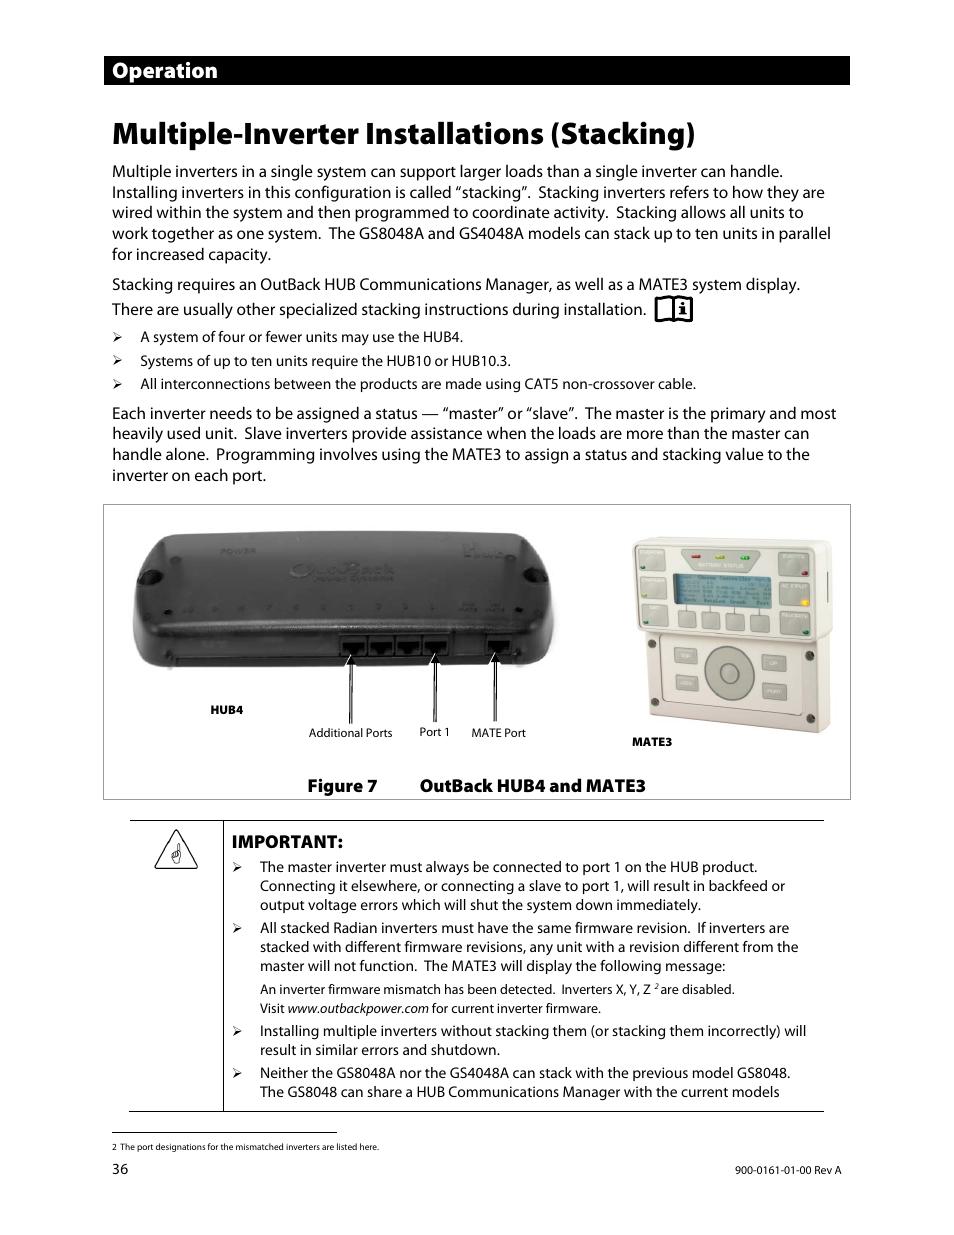 Multiple-inverter installations (stacking), Operation